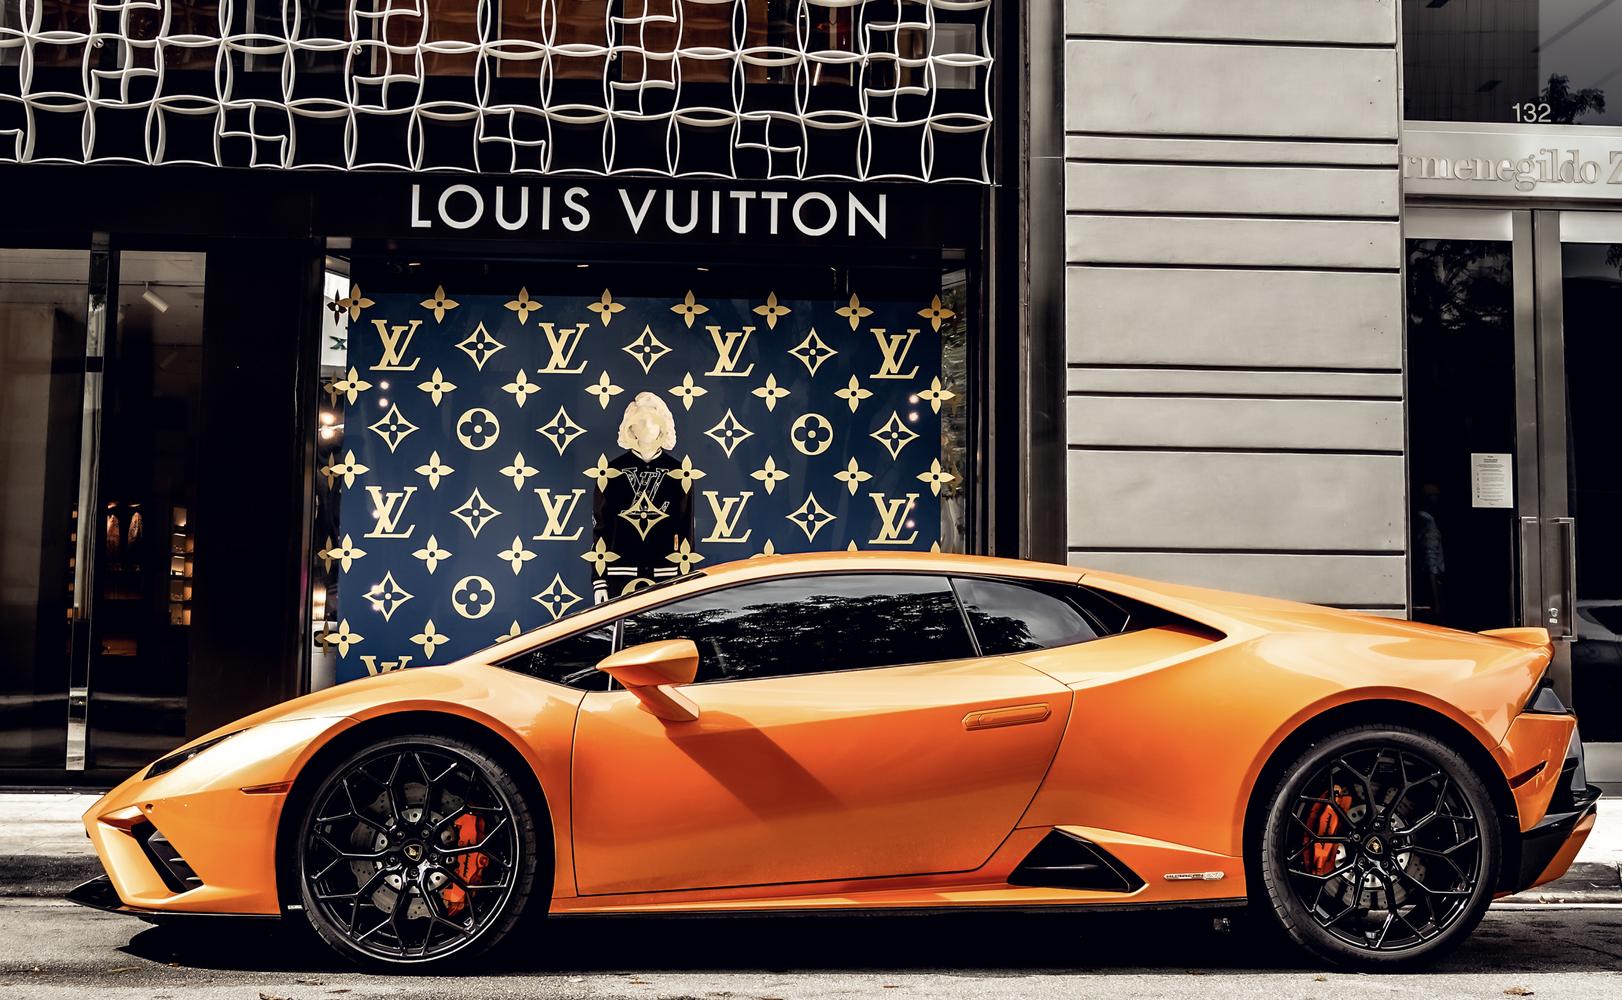 Image #2 of our  Lamborghini Huracan EVO Orange Coupe    In Miami Fort Lauderdale Palm Beach South Florida